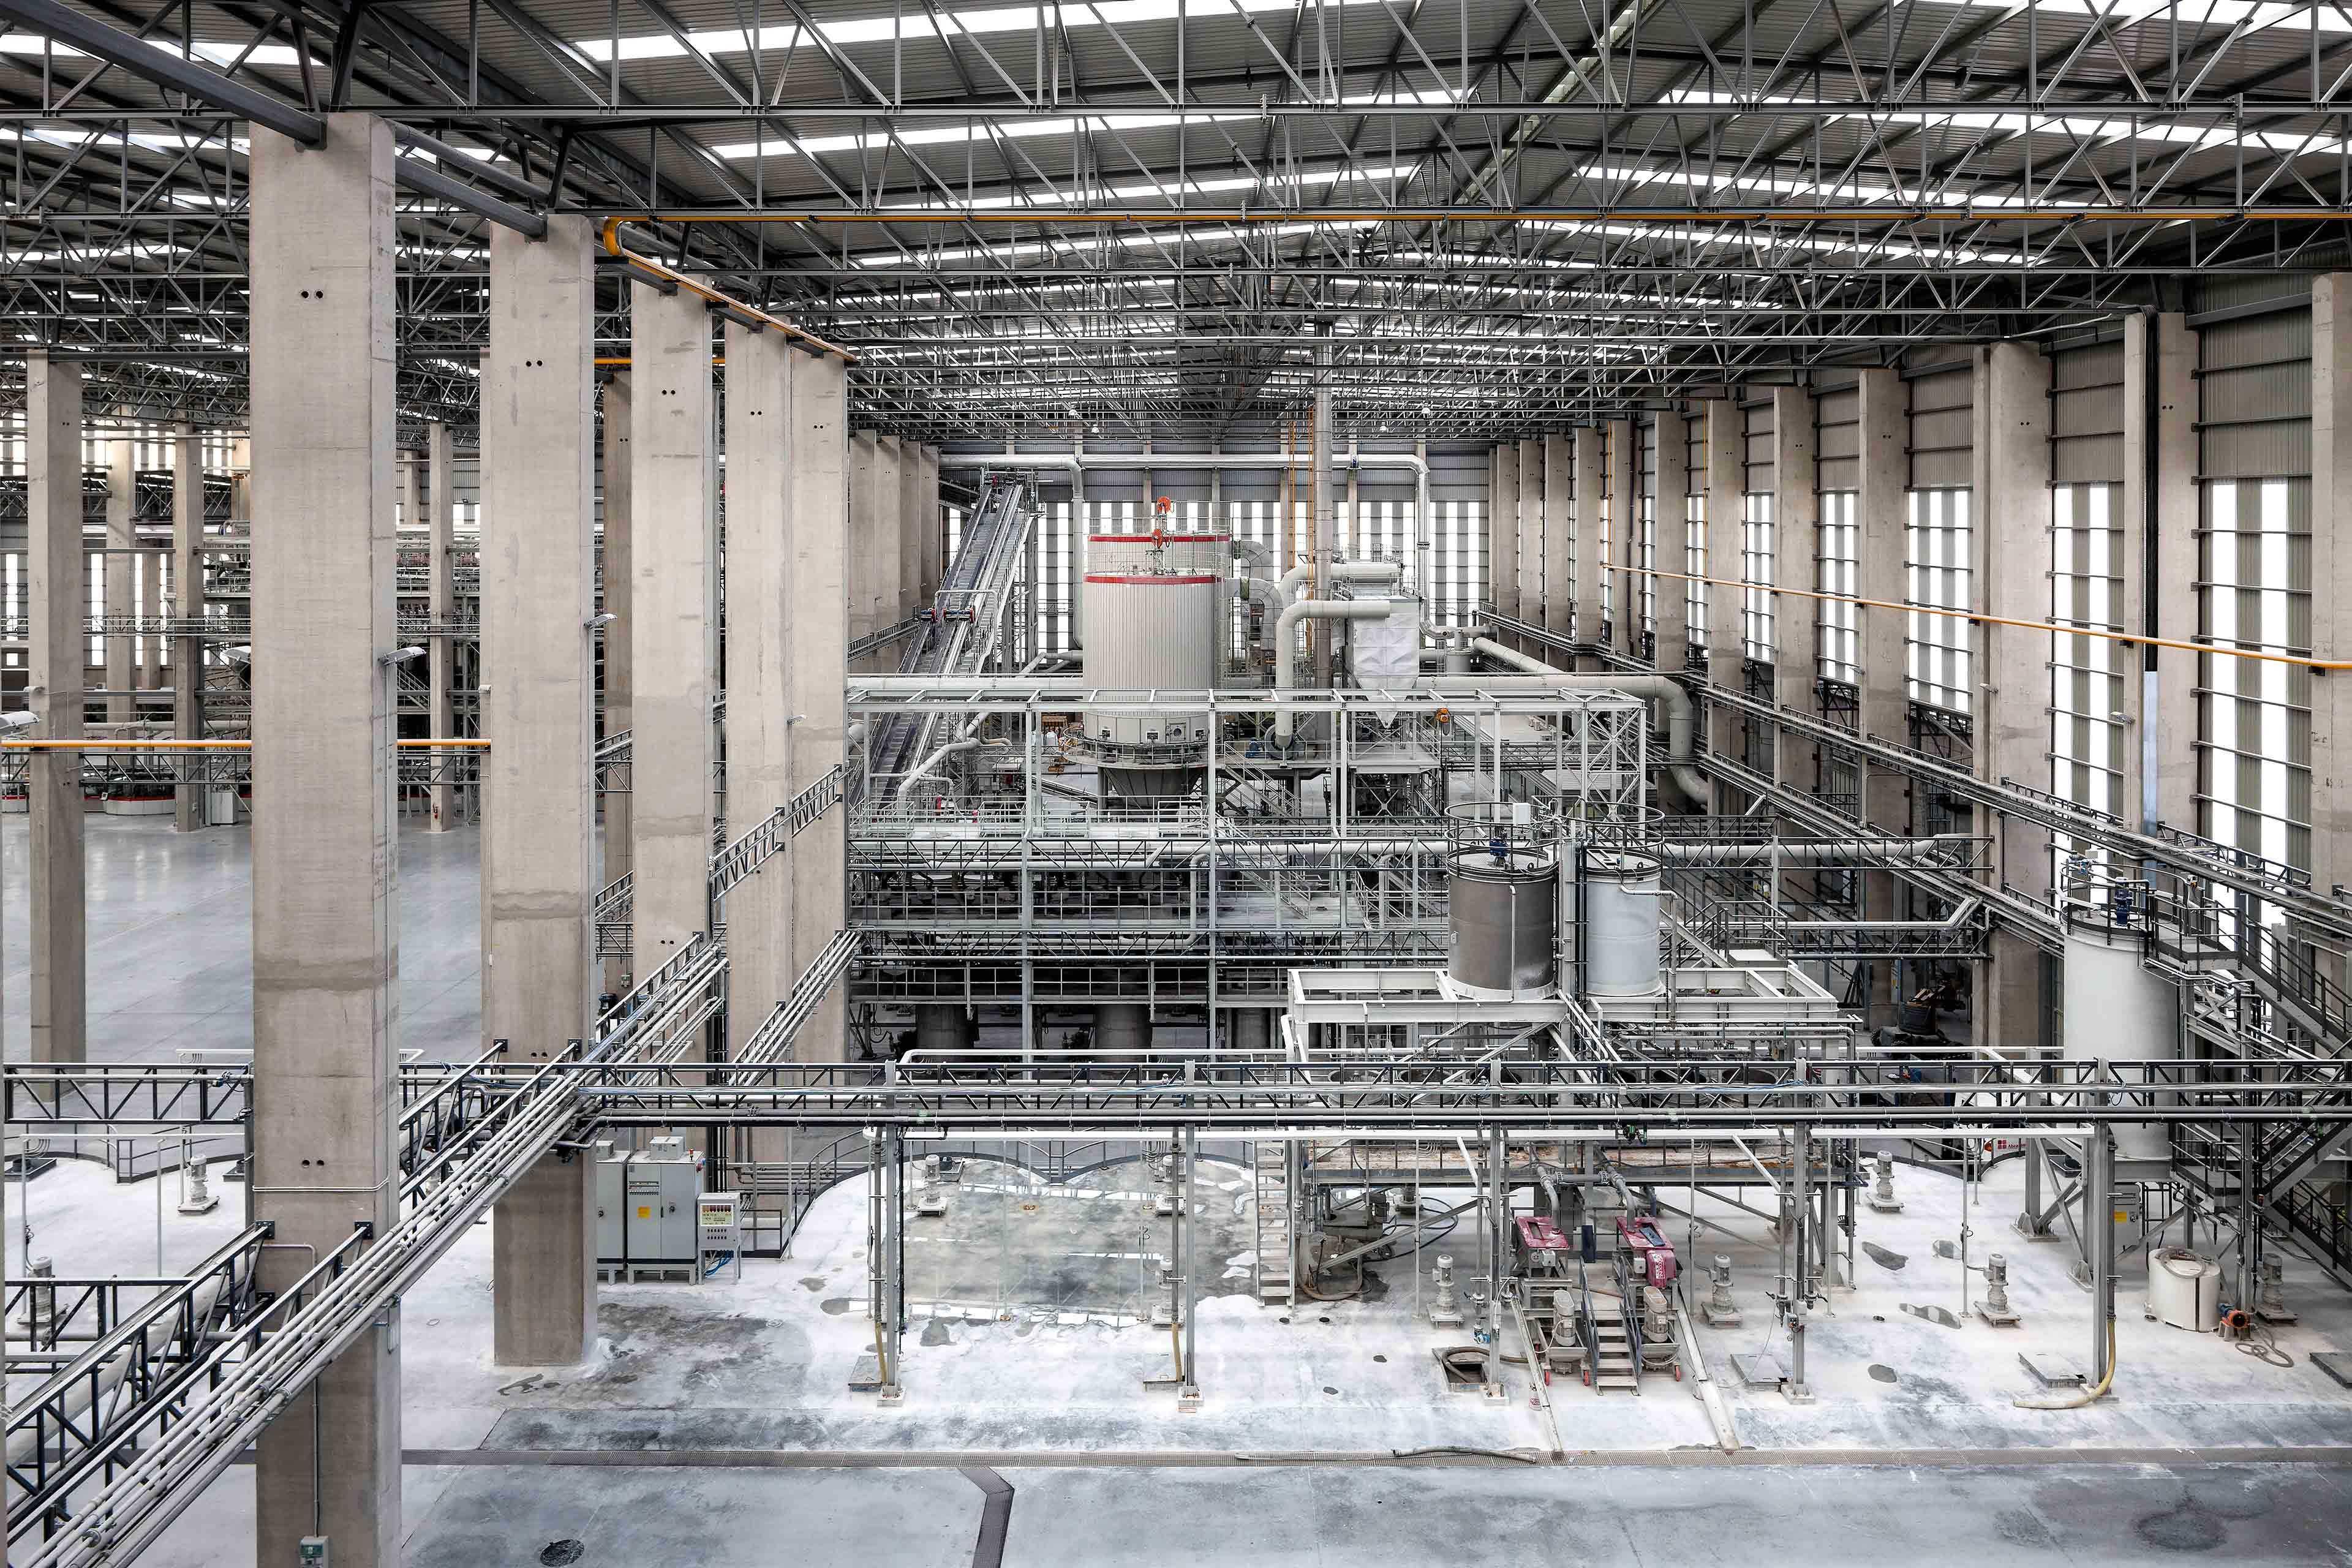 Dekton, a New Building Material  - 03b 46